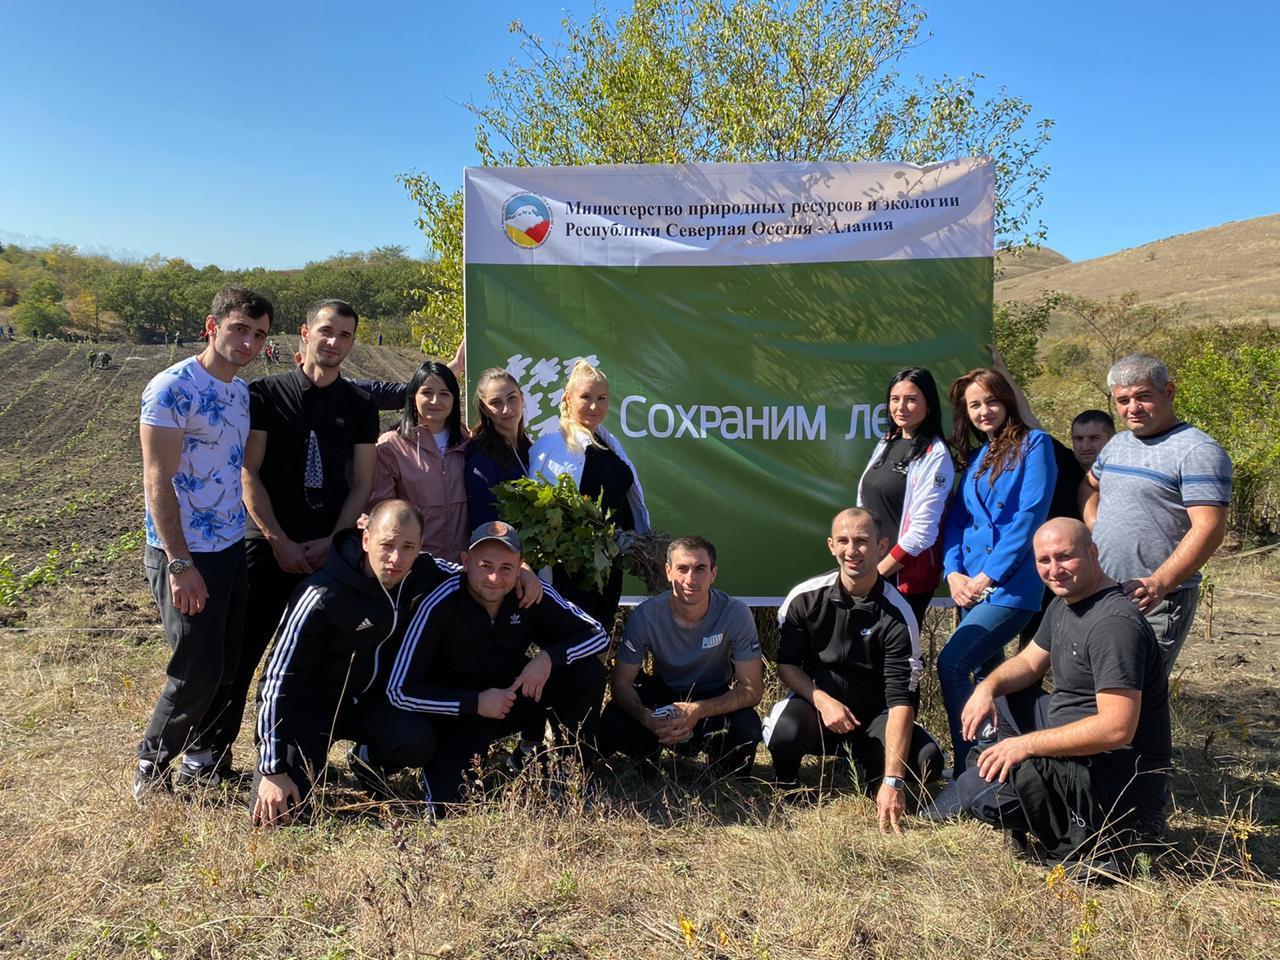 Сотрудники УФСИН приняли участие в акции «Сохраним лес»